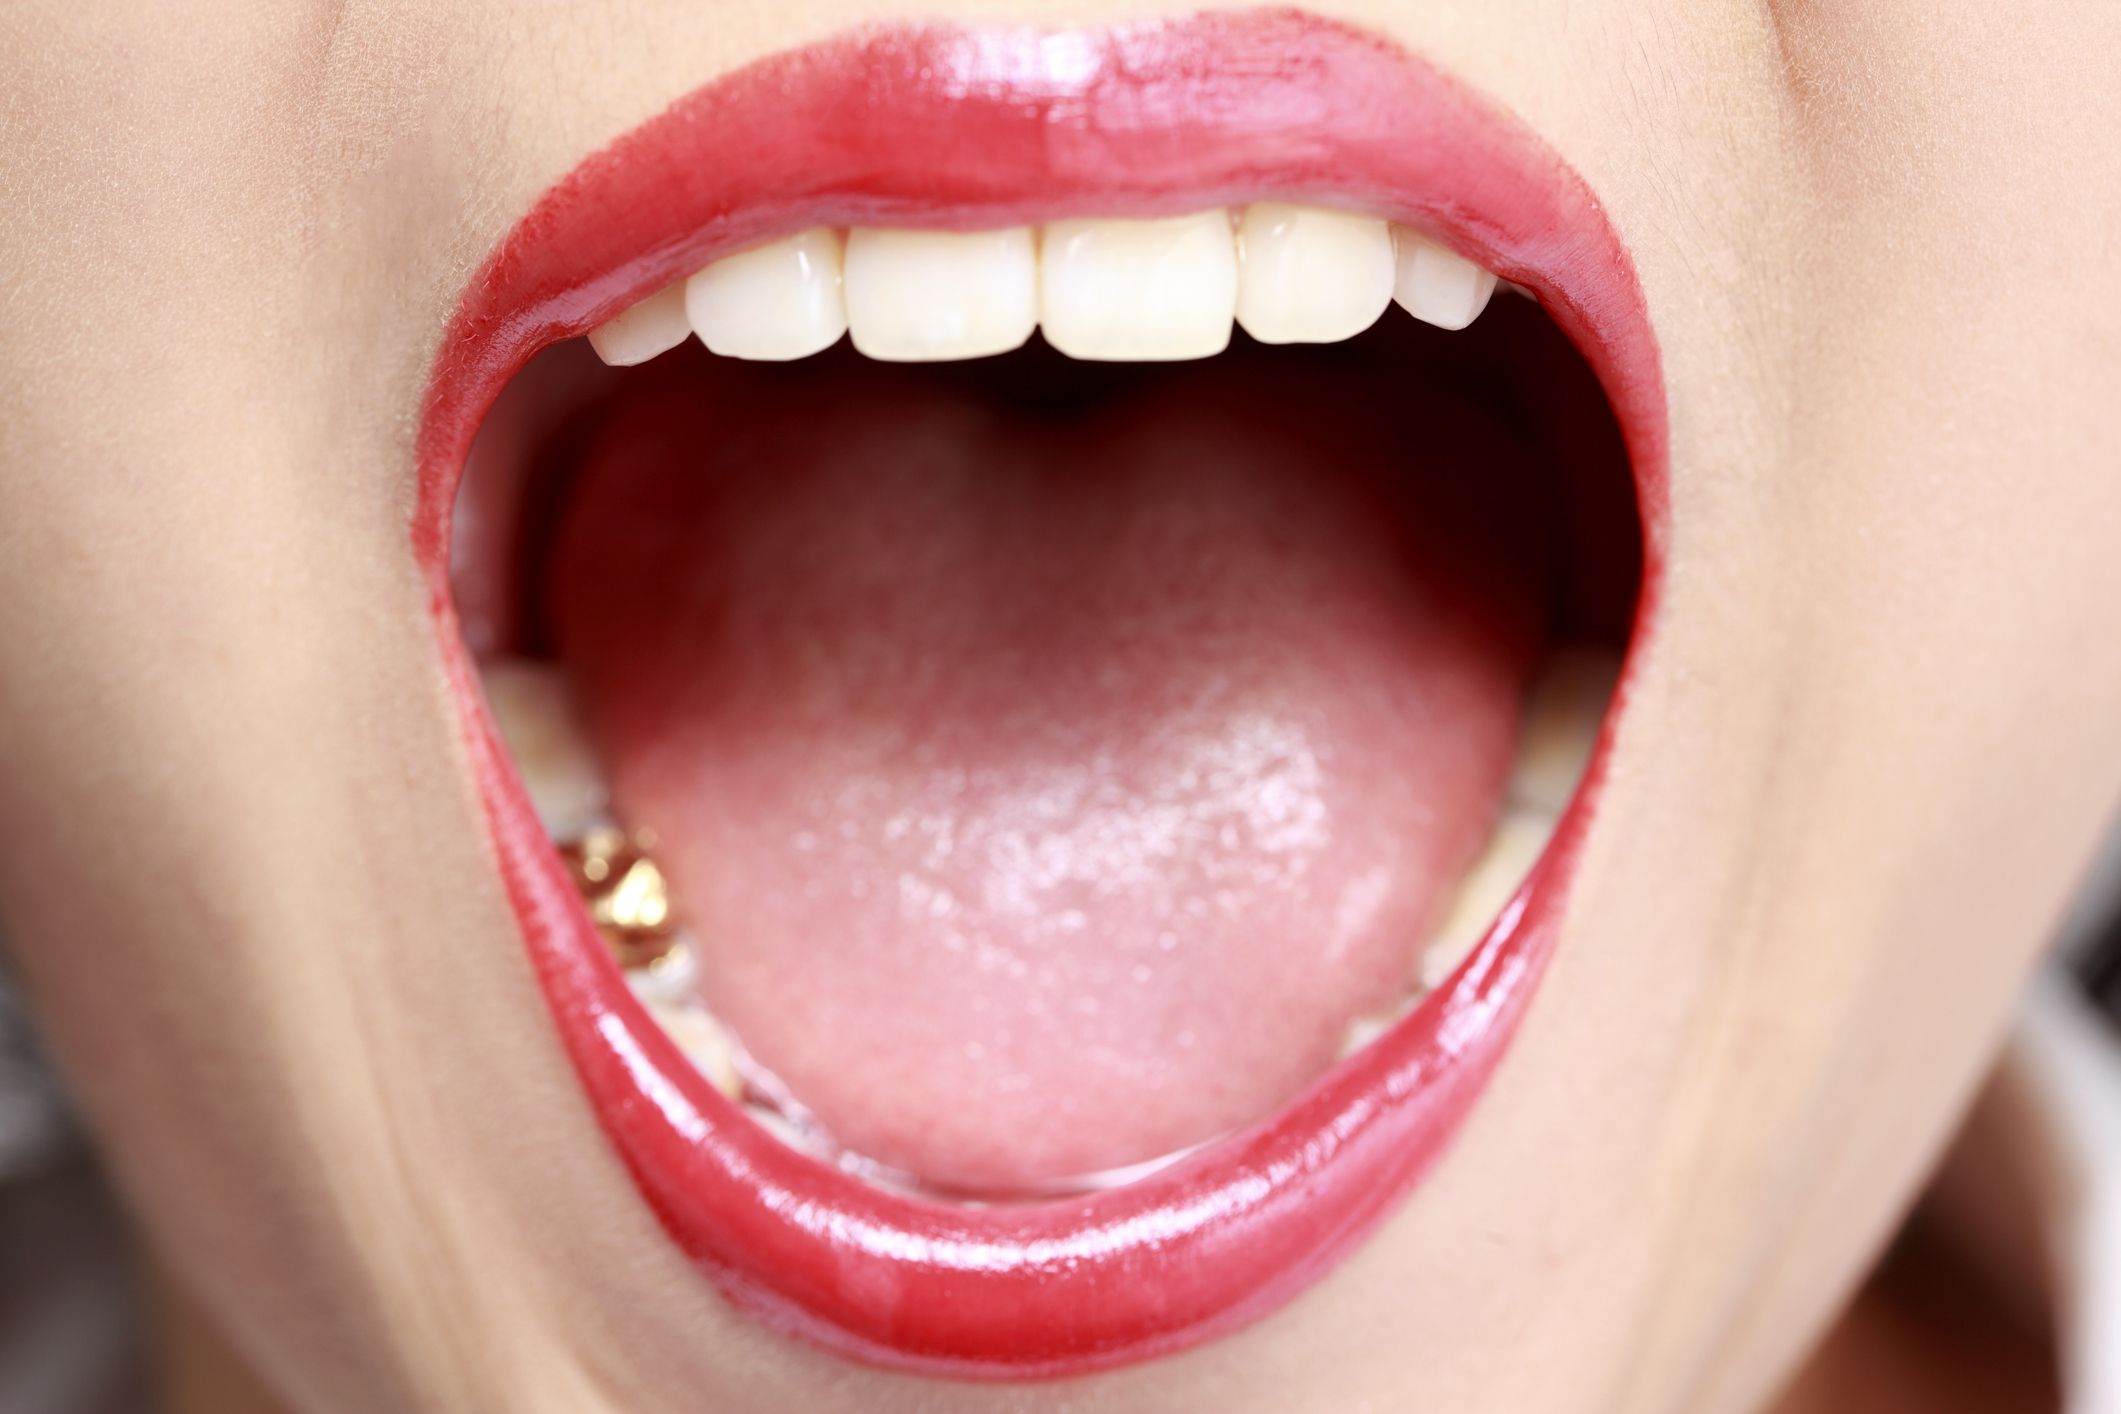 Daktarin Oral Gel Miconazole